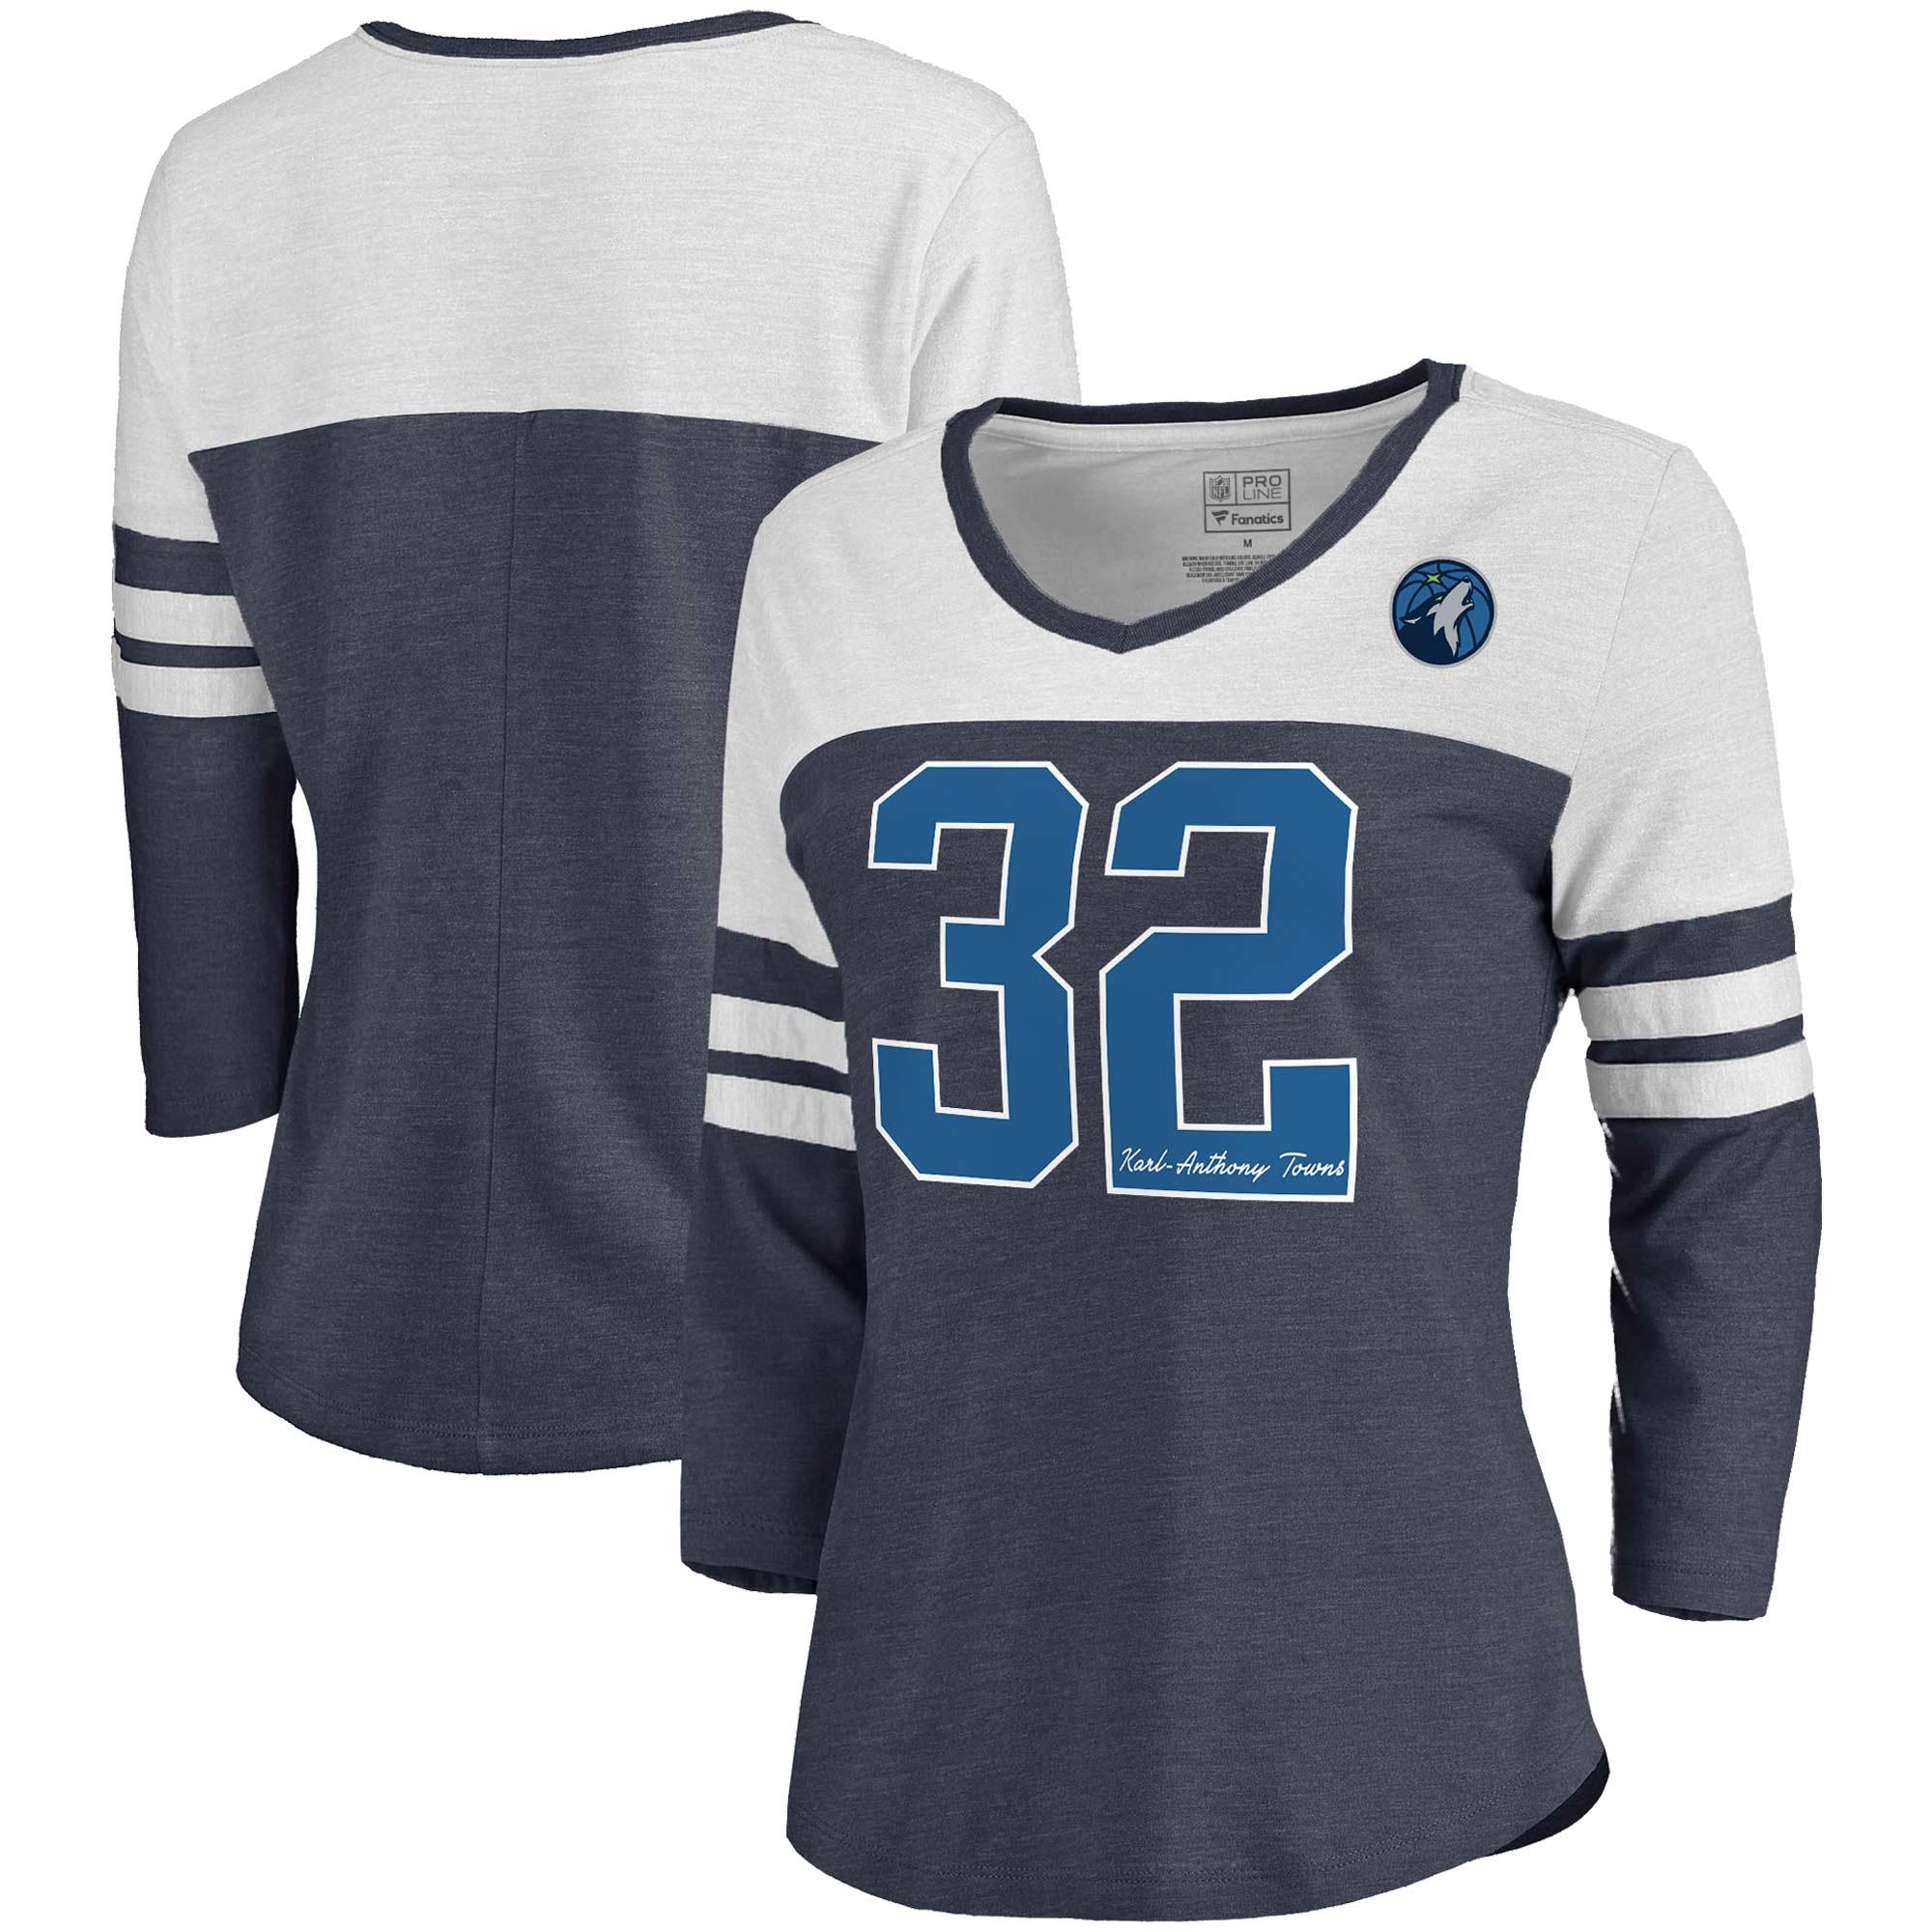 Karl-Anthony Towns Minnesota Timberwolves Fanatics Branded Women's Starstruck Name & Number Tri-Blend 3/4-Sleeve V-Neck T-Shirt - Navy